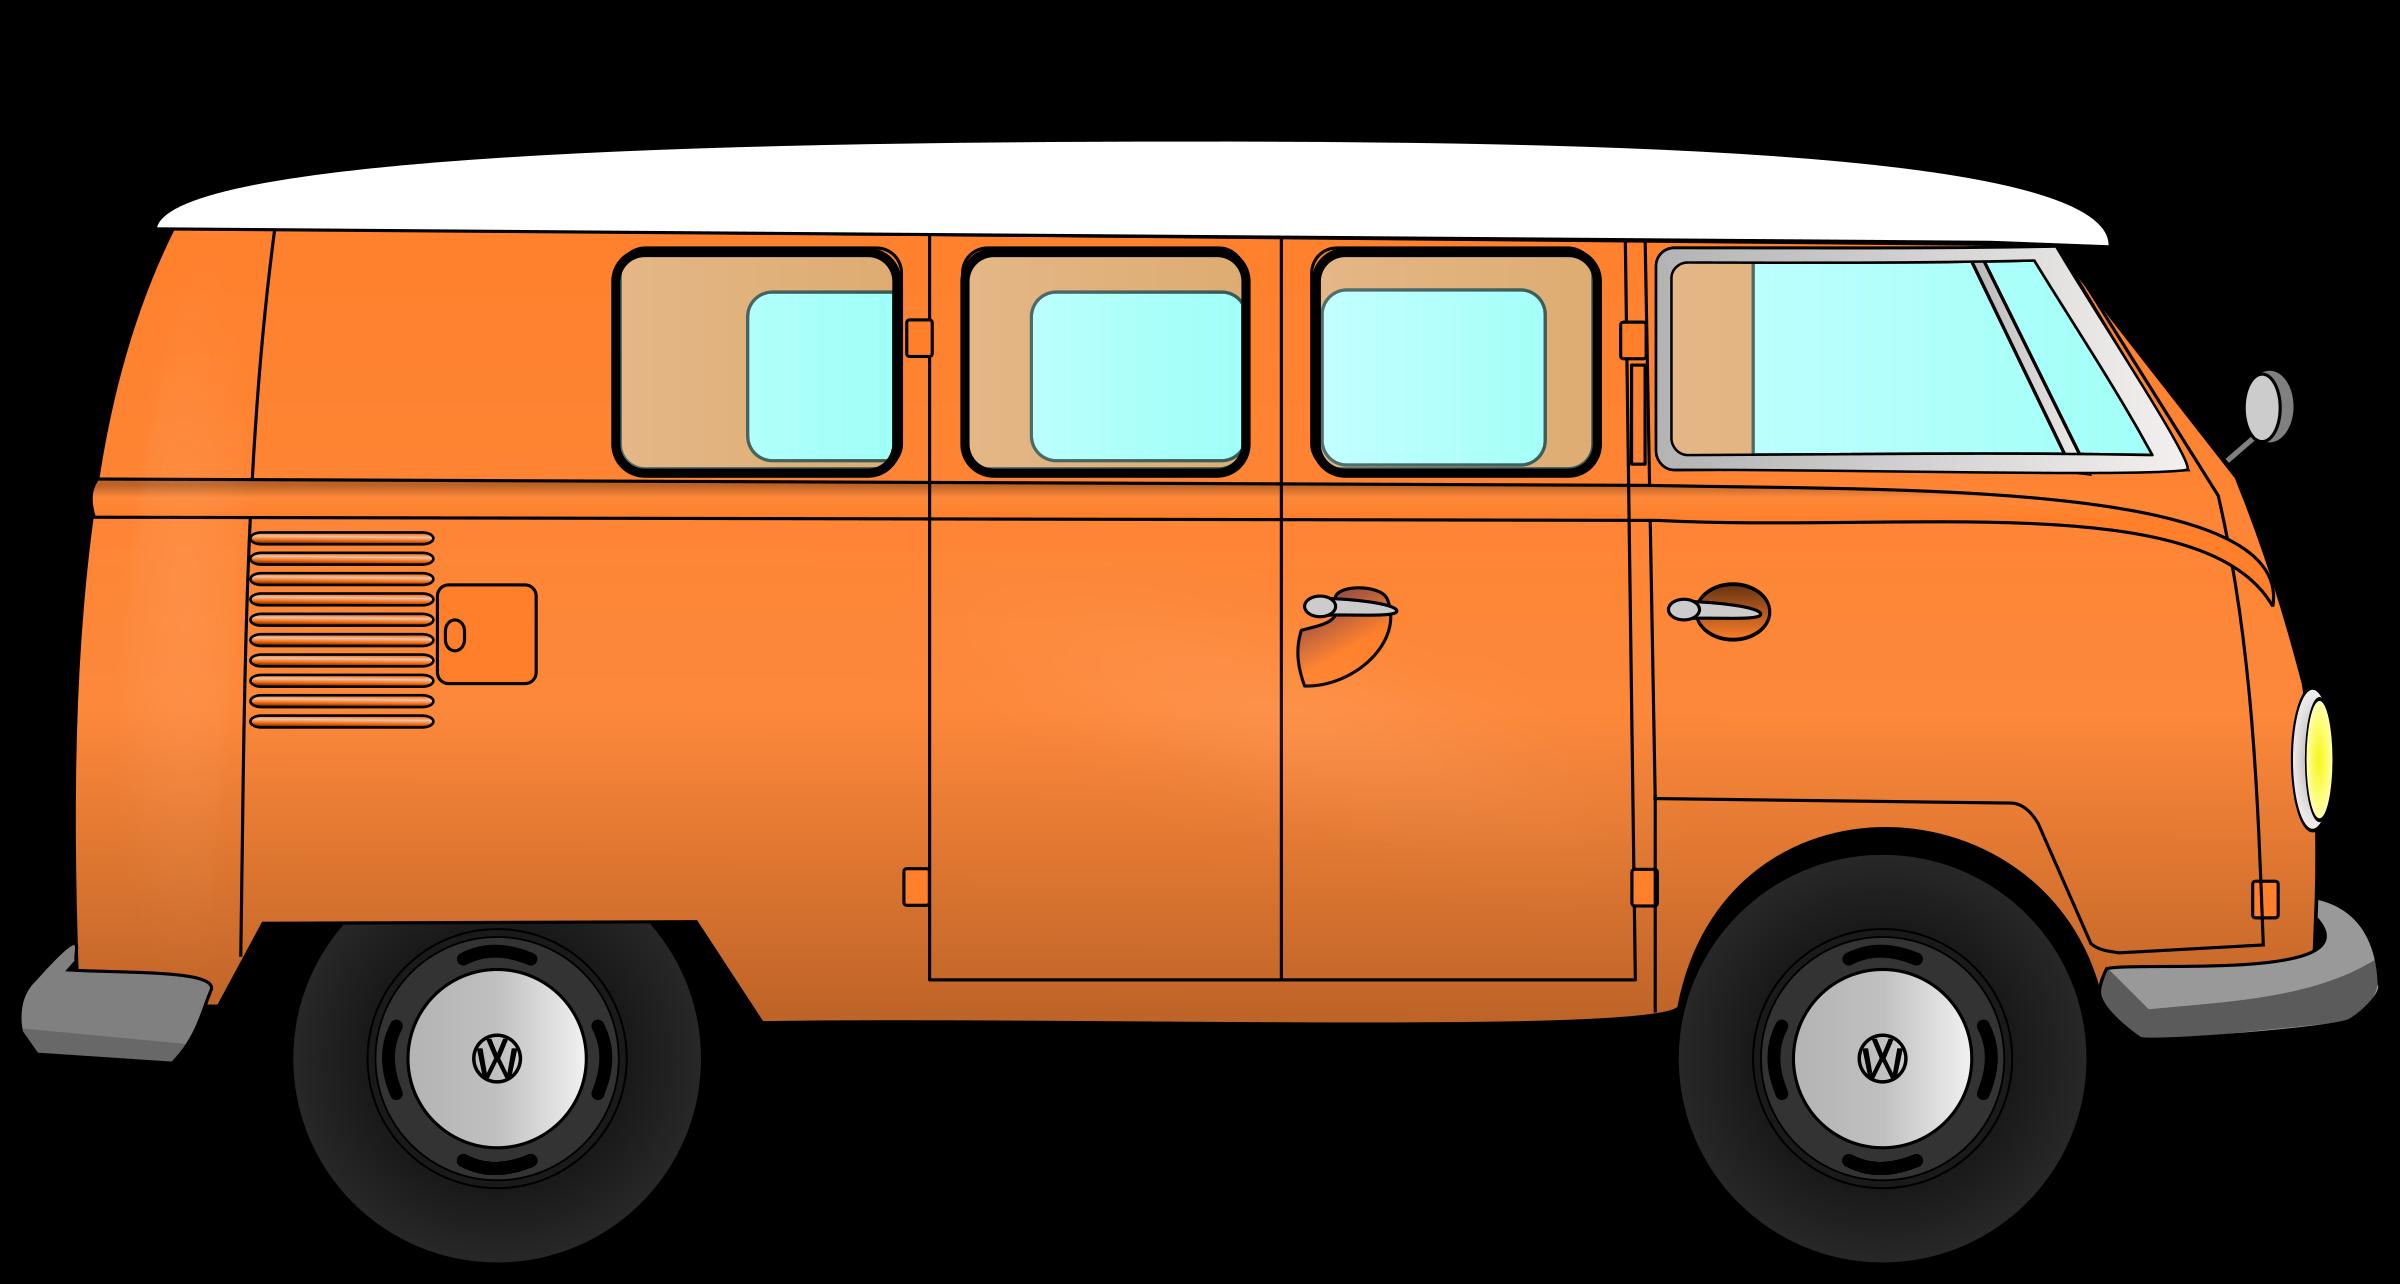 Car transporter clipart svg Clipart - VW combi svg